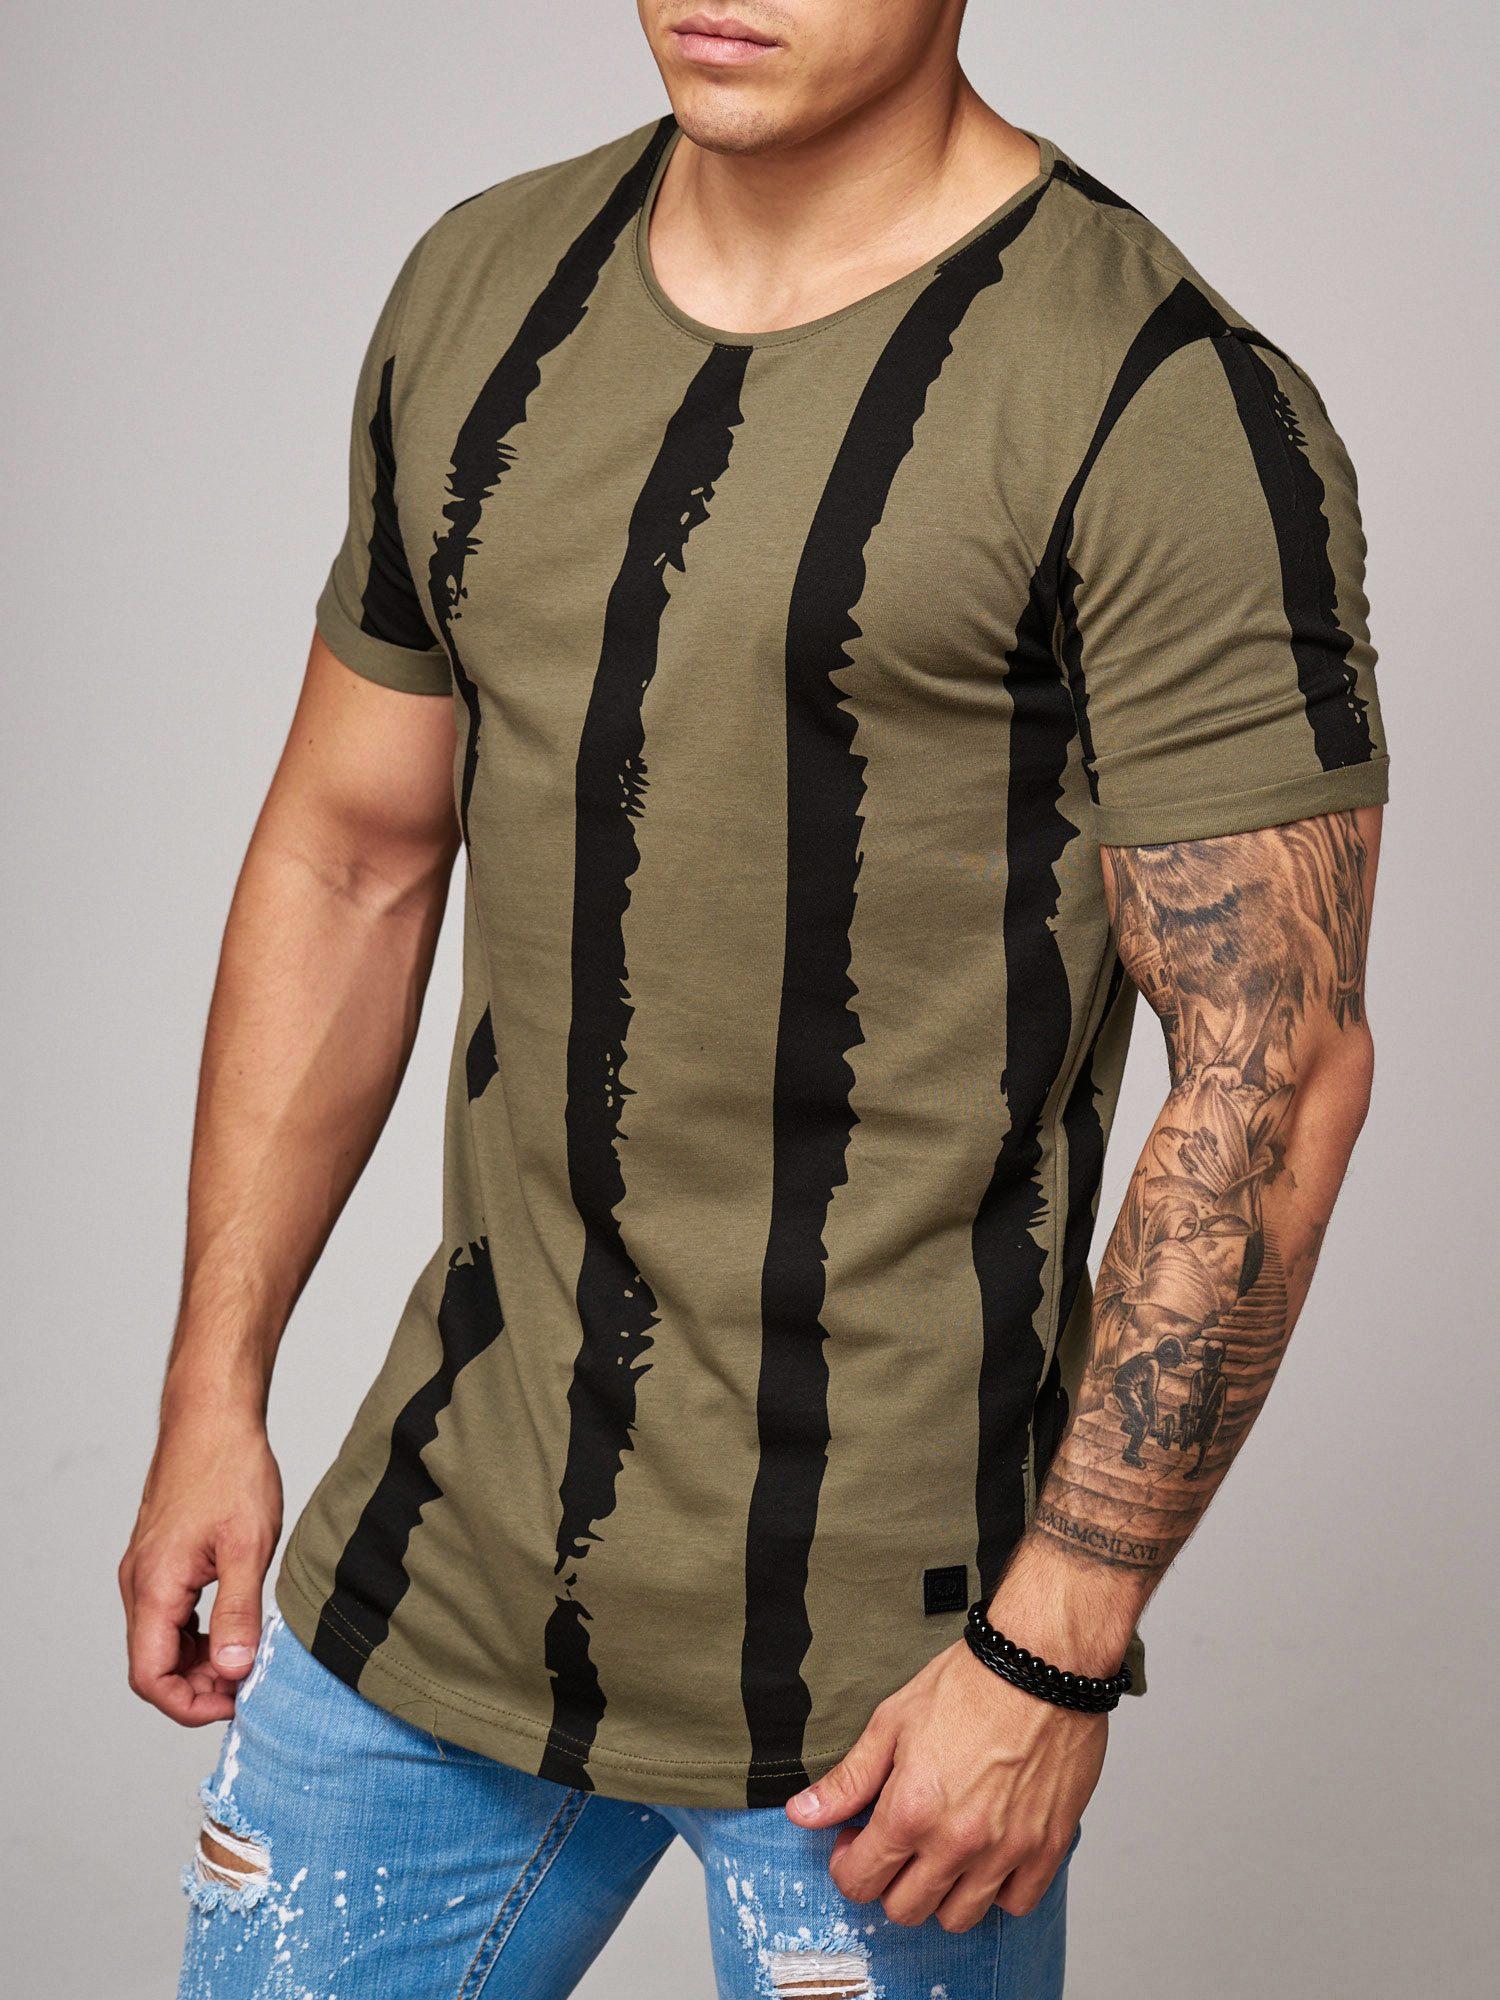 T-shirt-da-Uomo-Polo-Shirt-a-Maniche-Corte-printshirt-Polo-a-Maniche-Corte-17018-John-Kayna miniatura 20